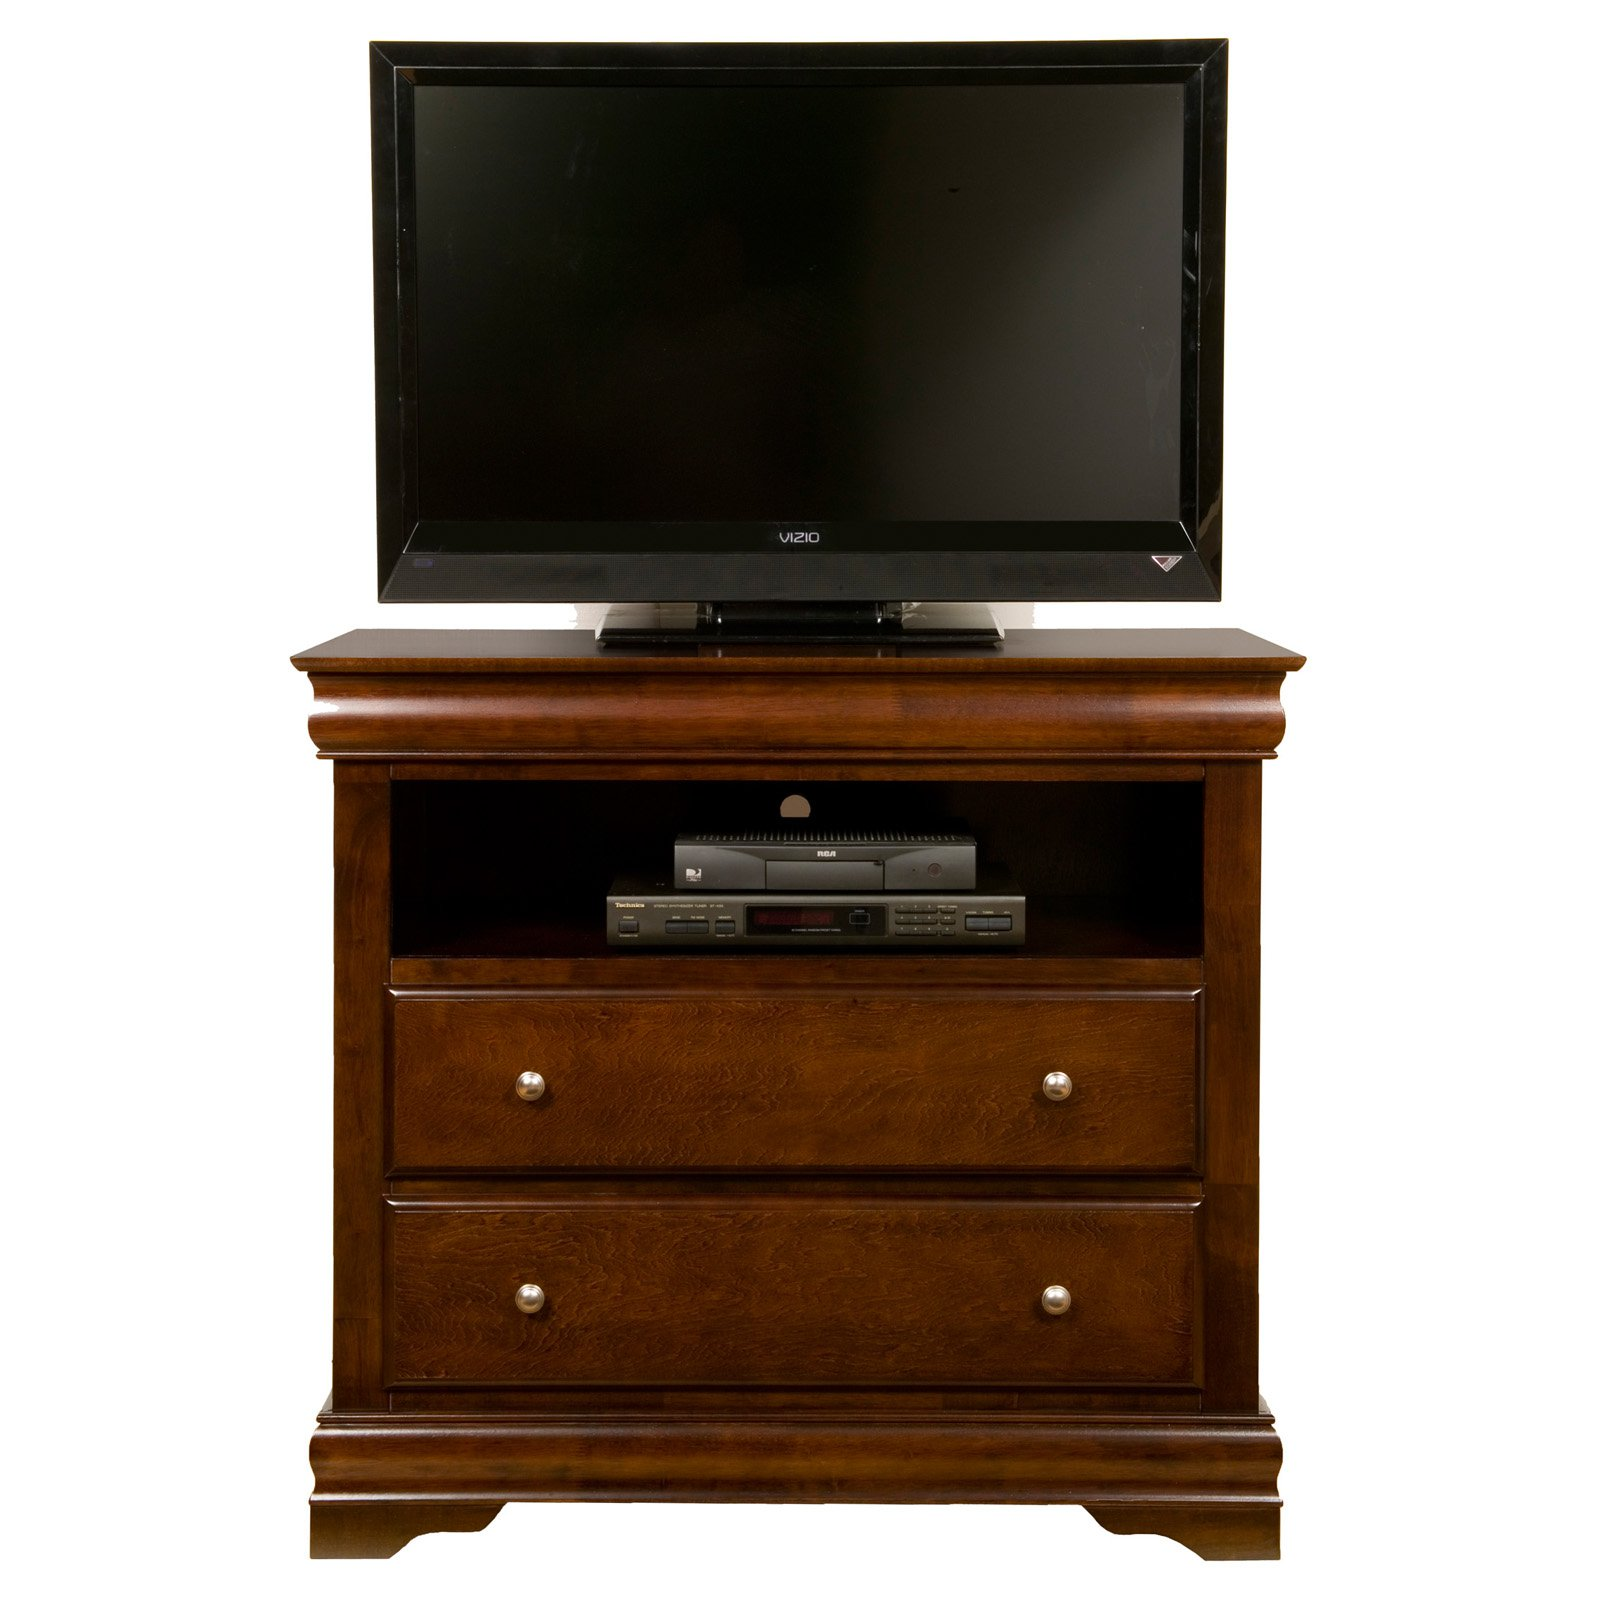 Alpine Furniture Chesapeake 2-Drawer TV Media Chest - Cappuccino